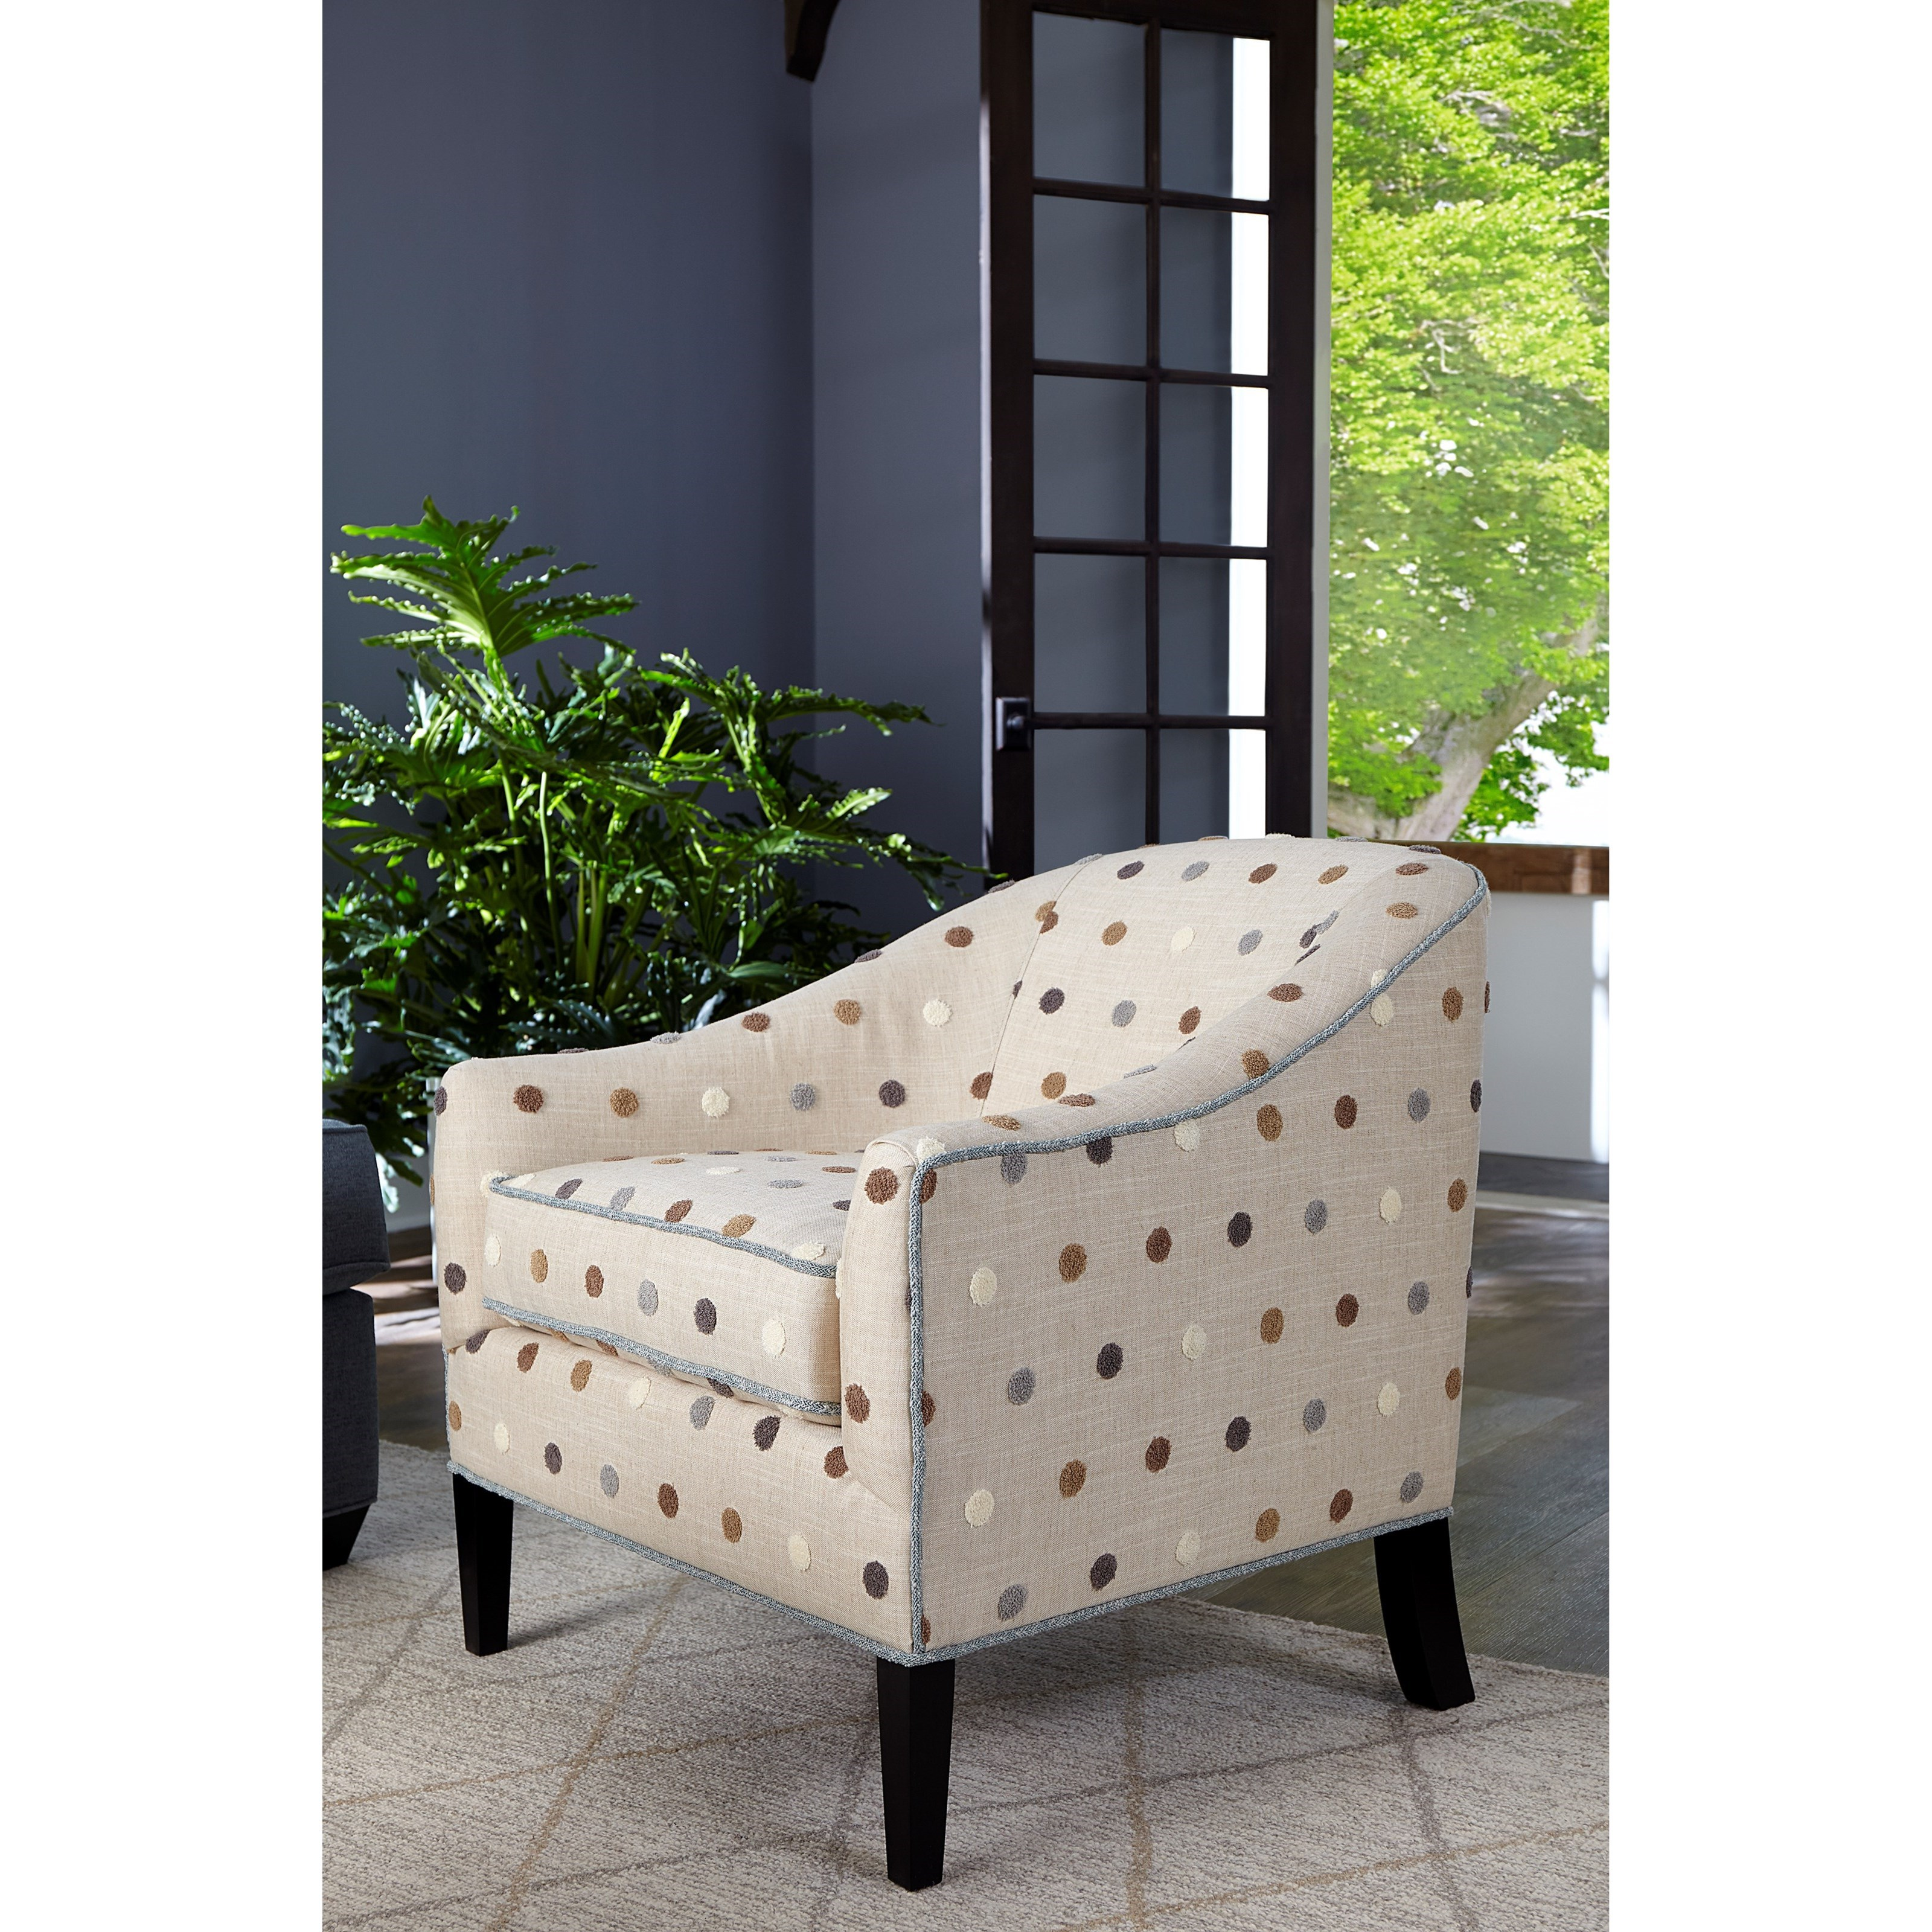 Brockton Upholstered Chair by Norwalk at Saugerties Furniture Mart